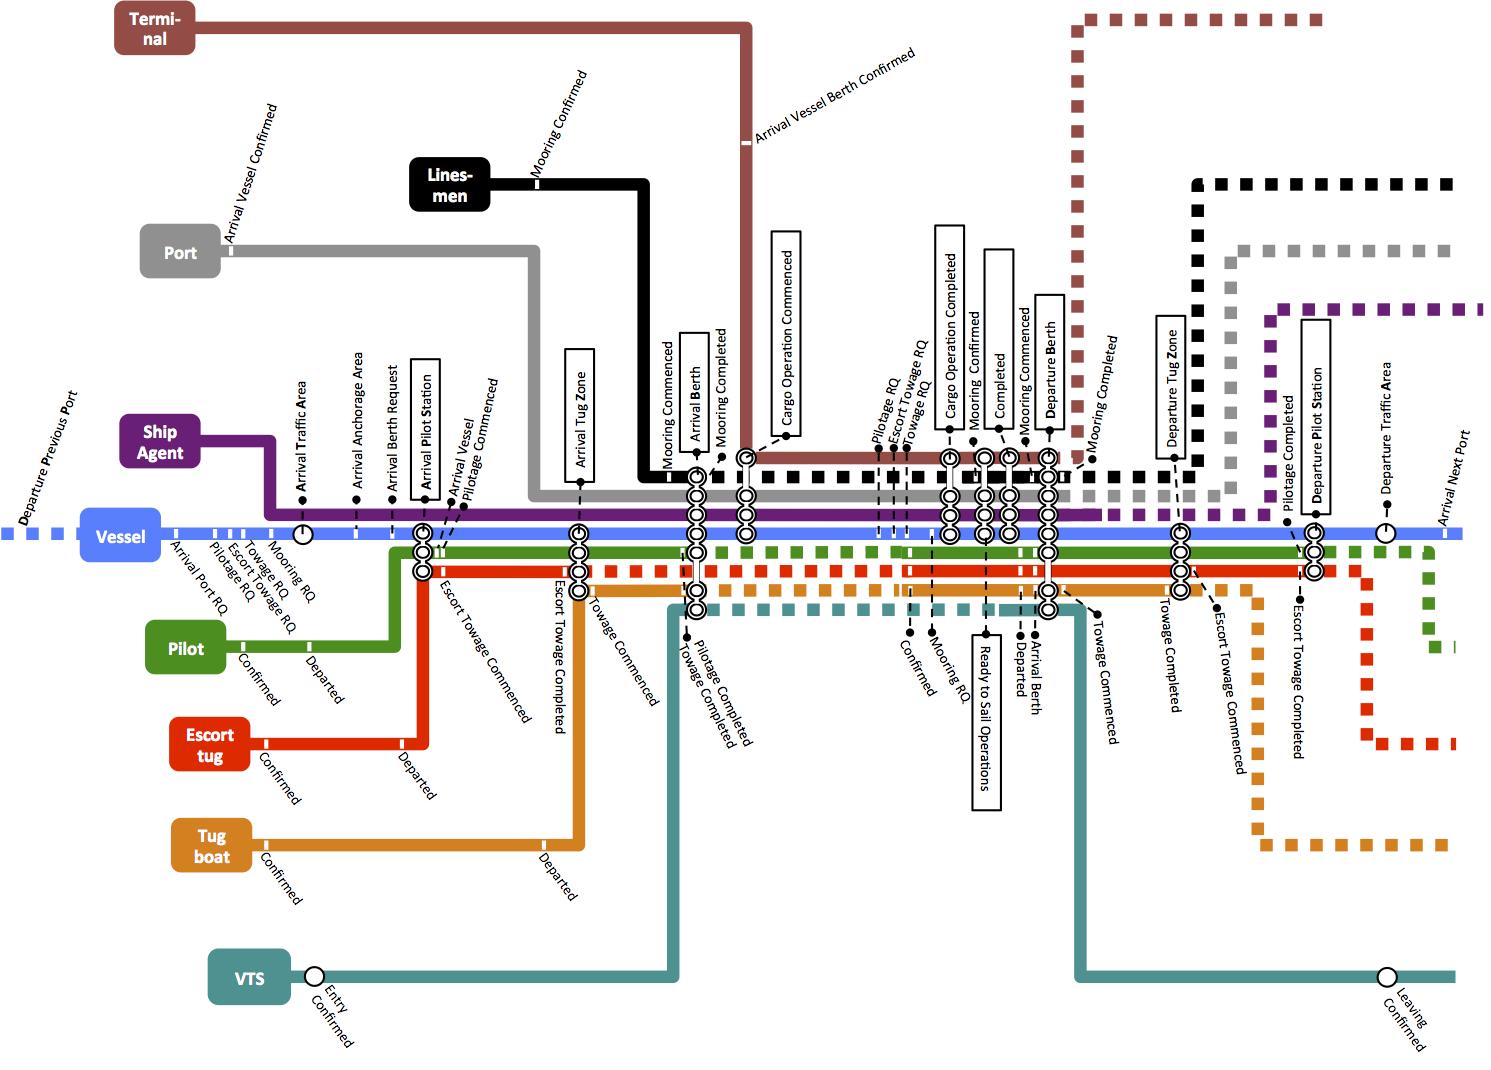 Project Management Subway Map.Subway Map Port Cdm Stm Sea Traffic Management Validation